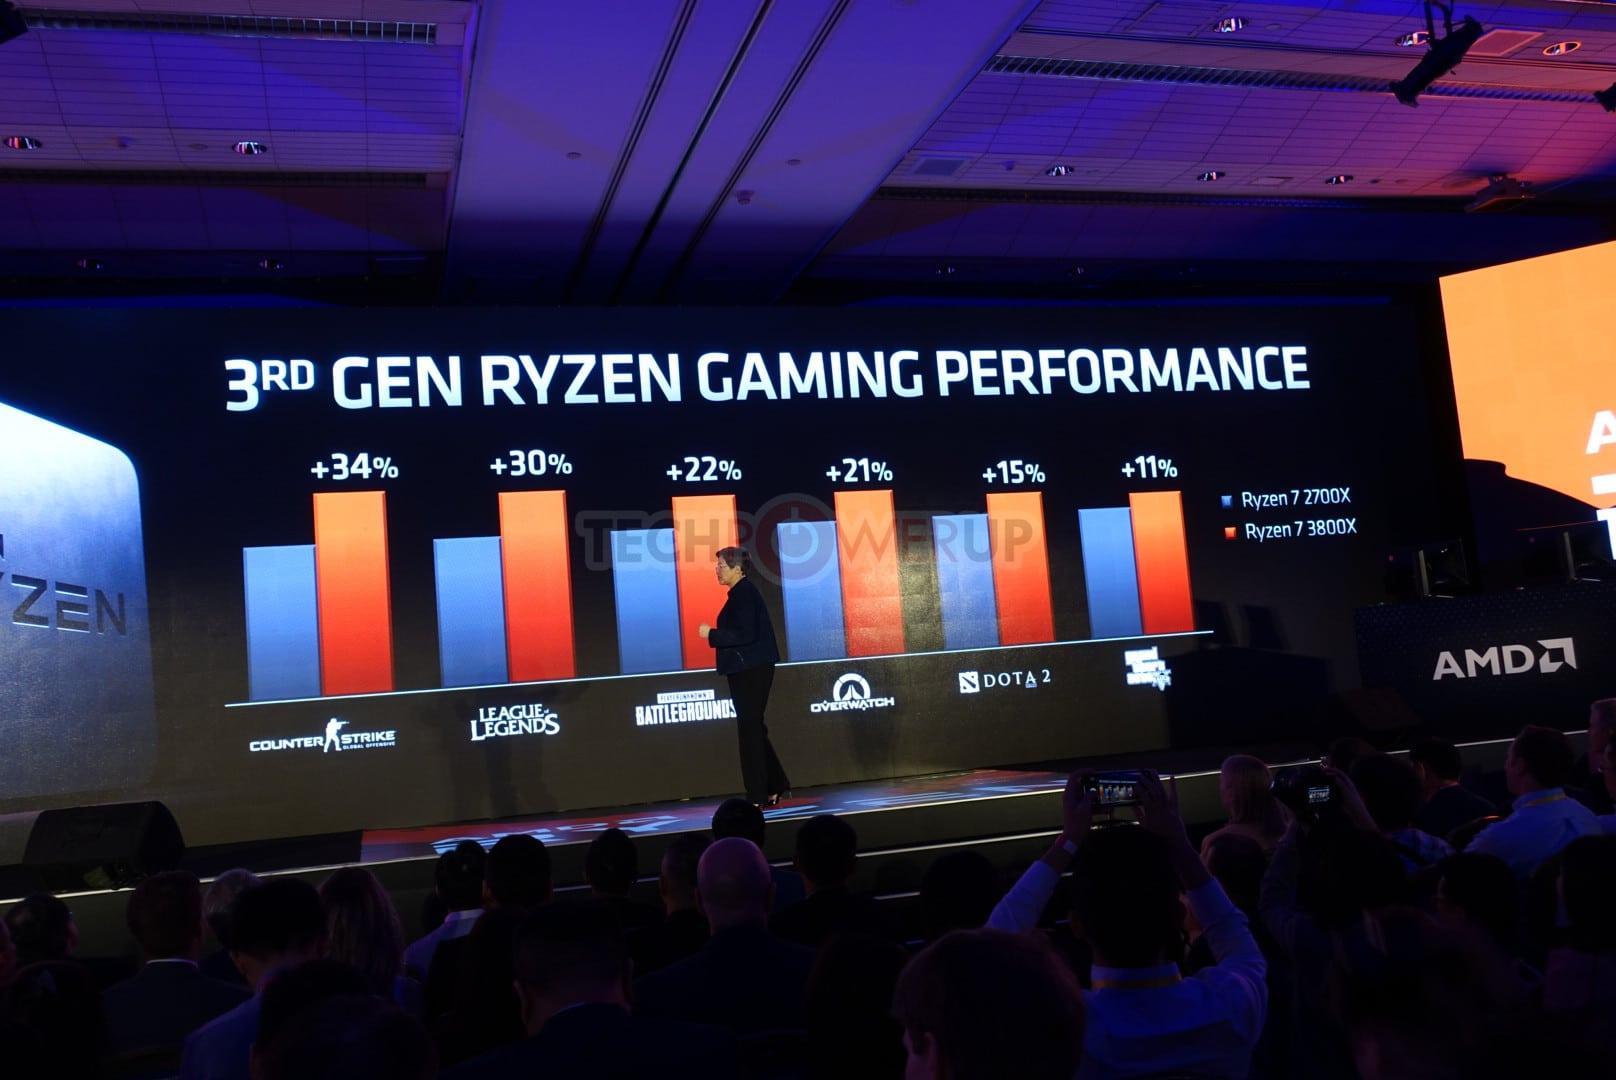 Performances AMD Ryzen 7 3000